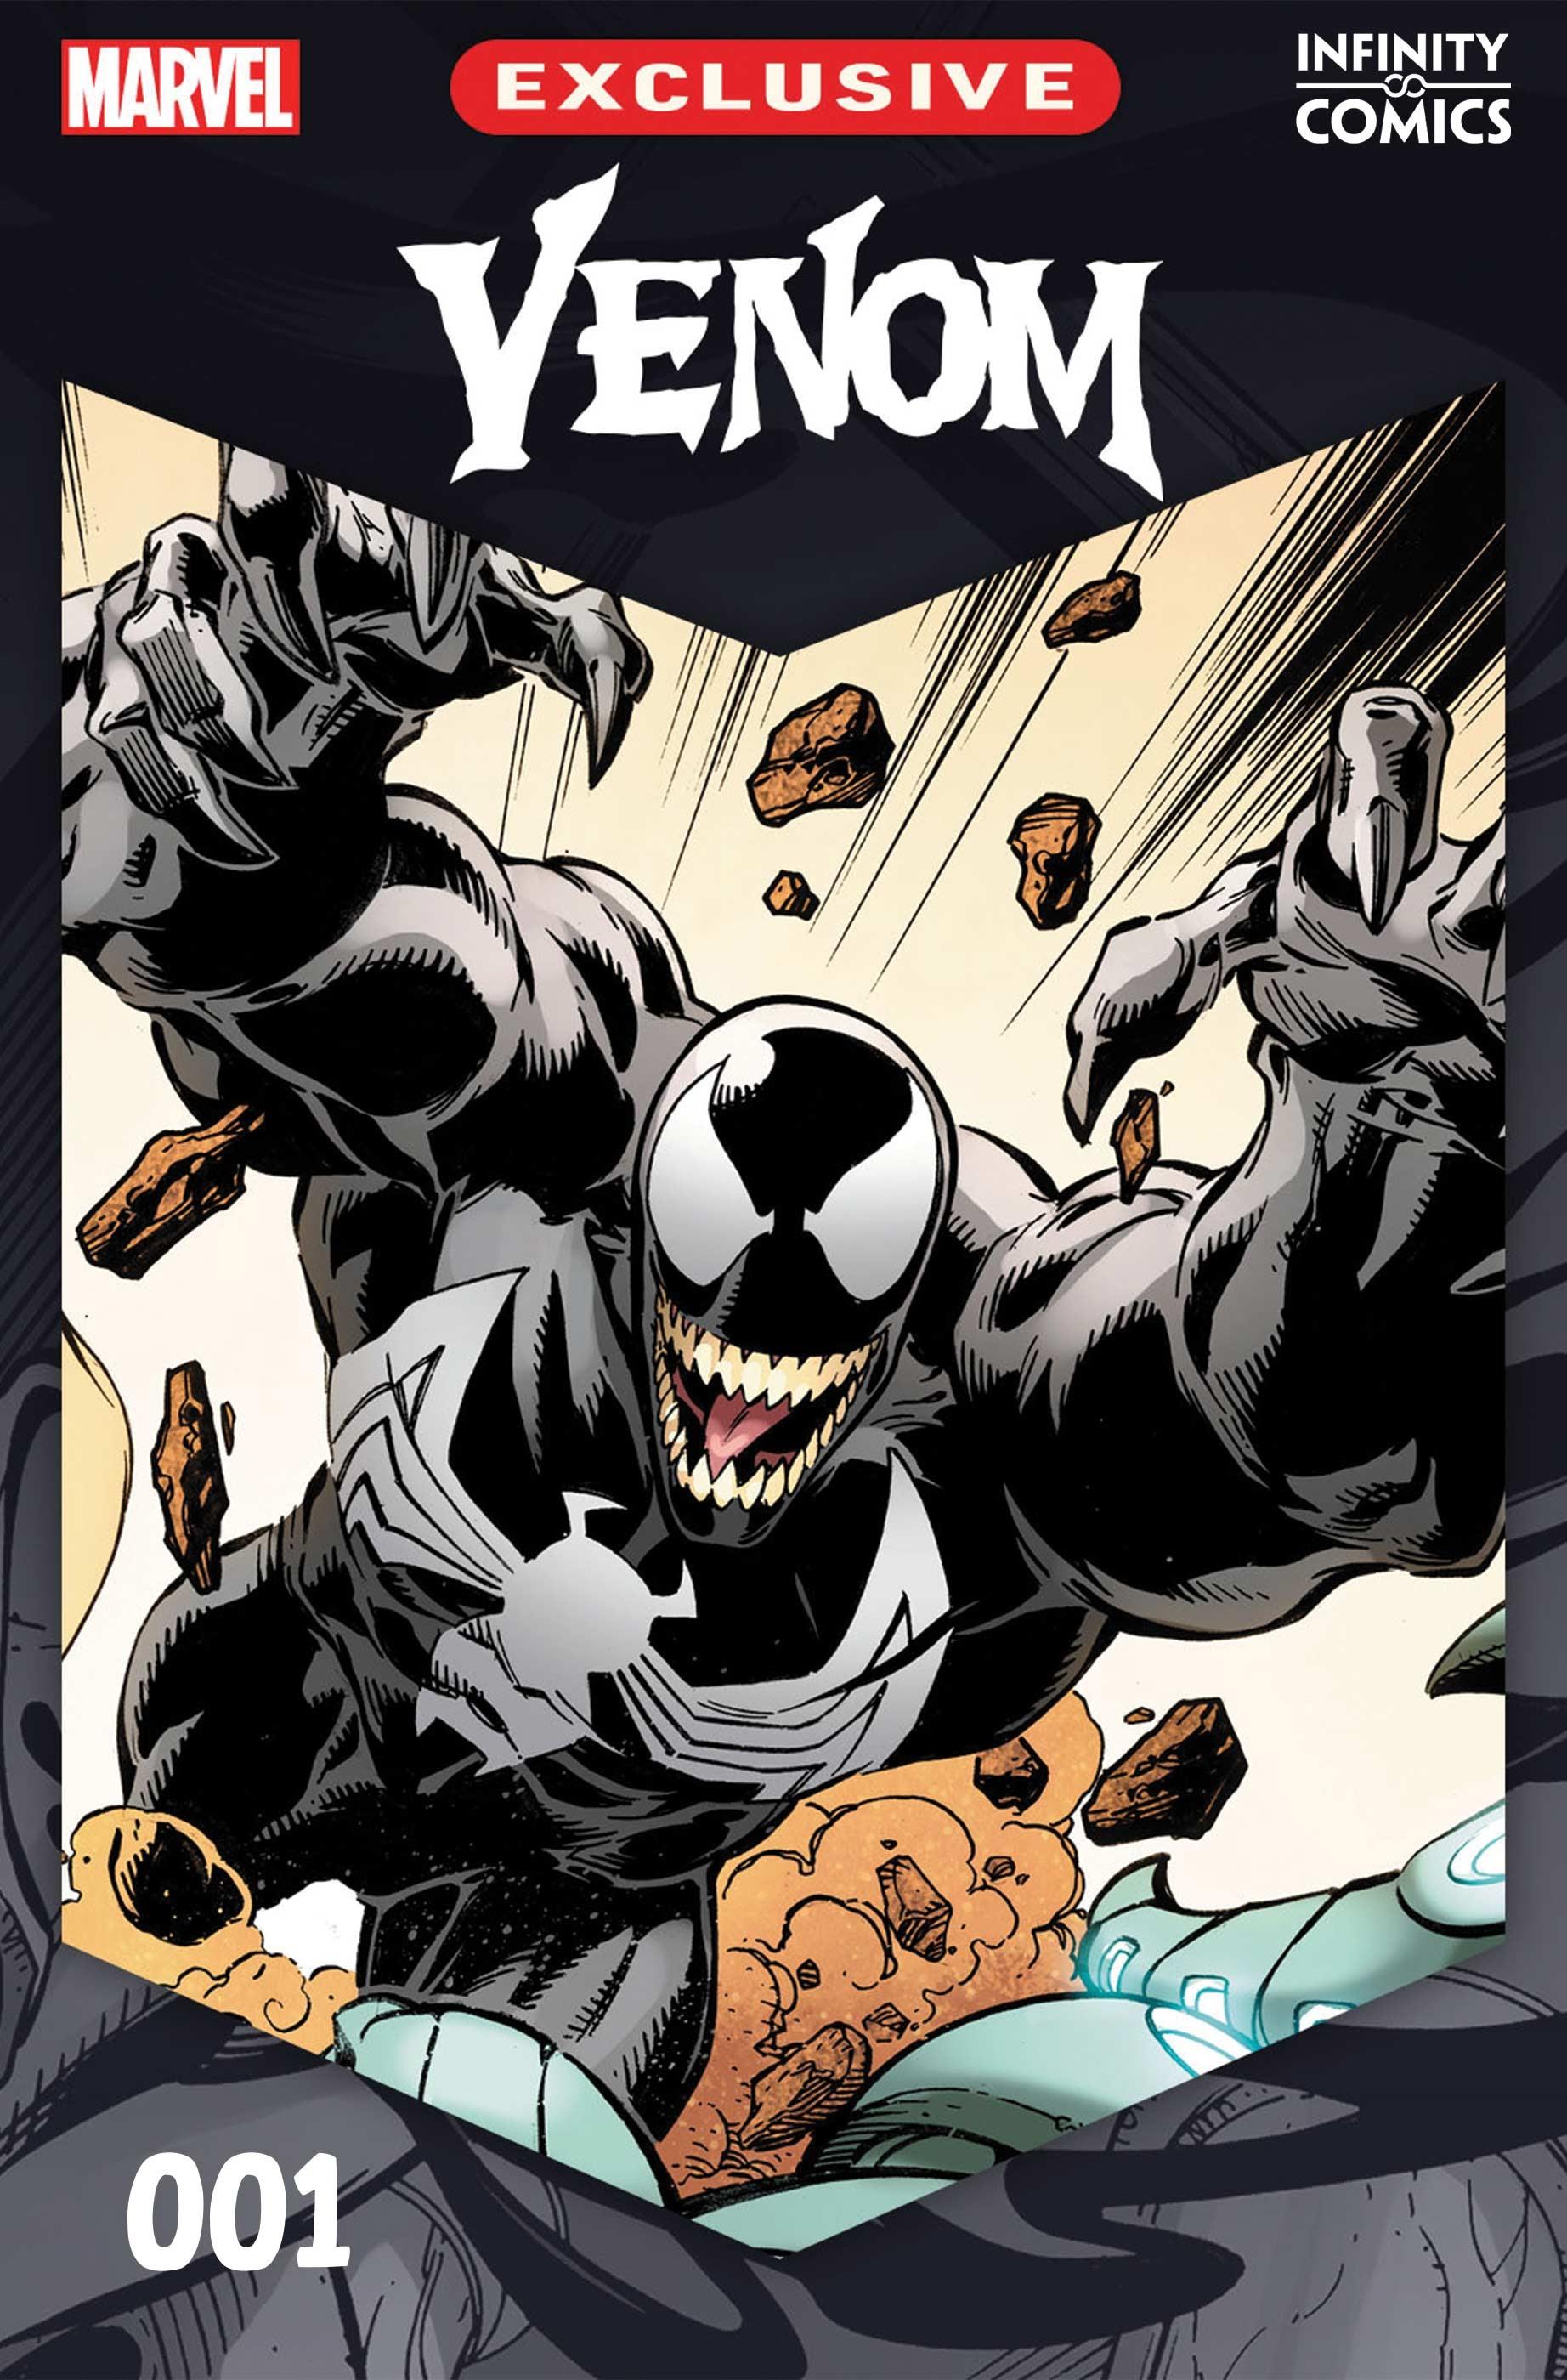 Venom: Infinity Comic Primer 1 Page 1